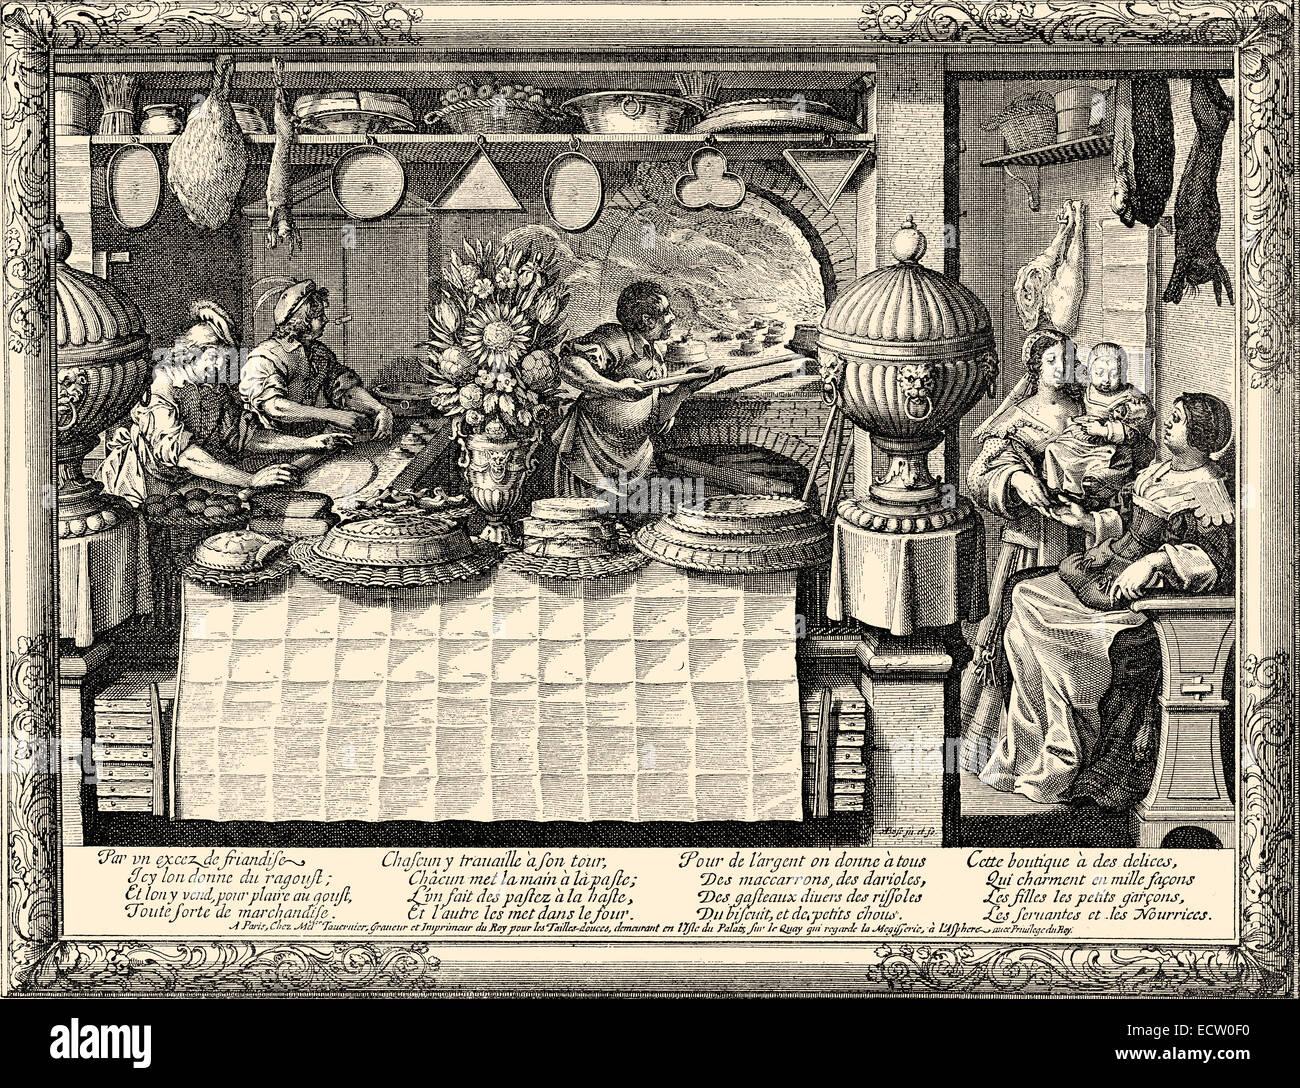 Confectioner, 17th century, Konditor, 17. Jahrhundert - Stock Image